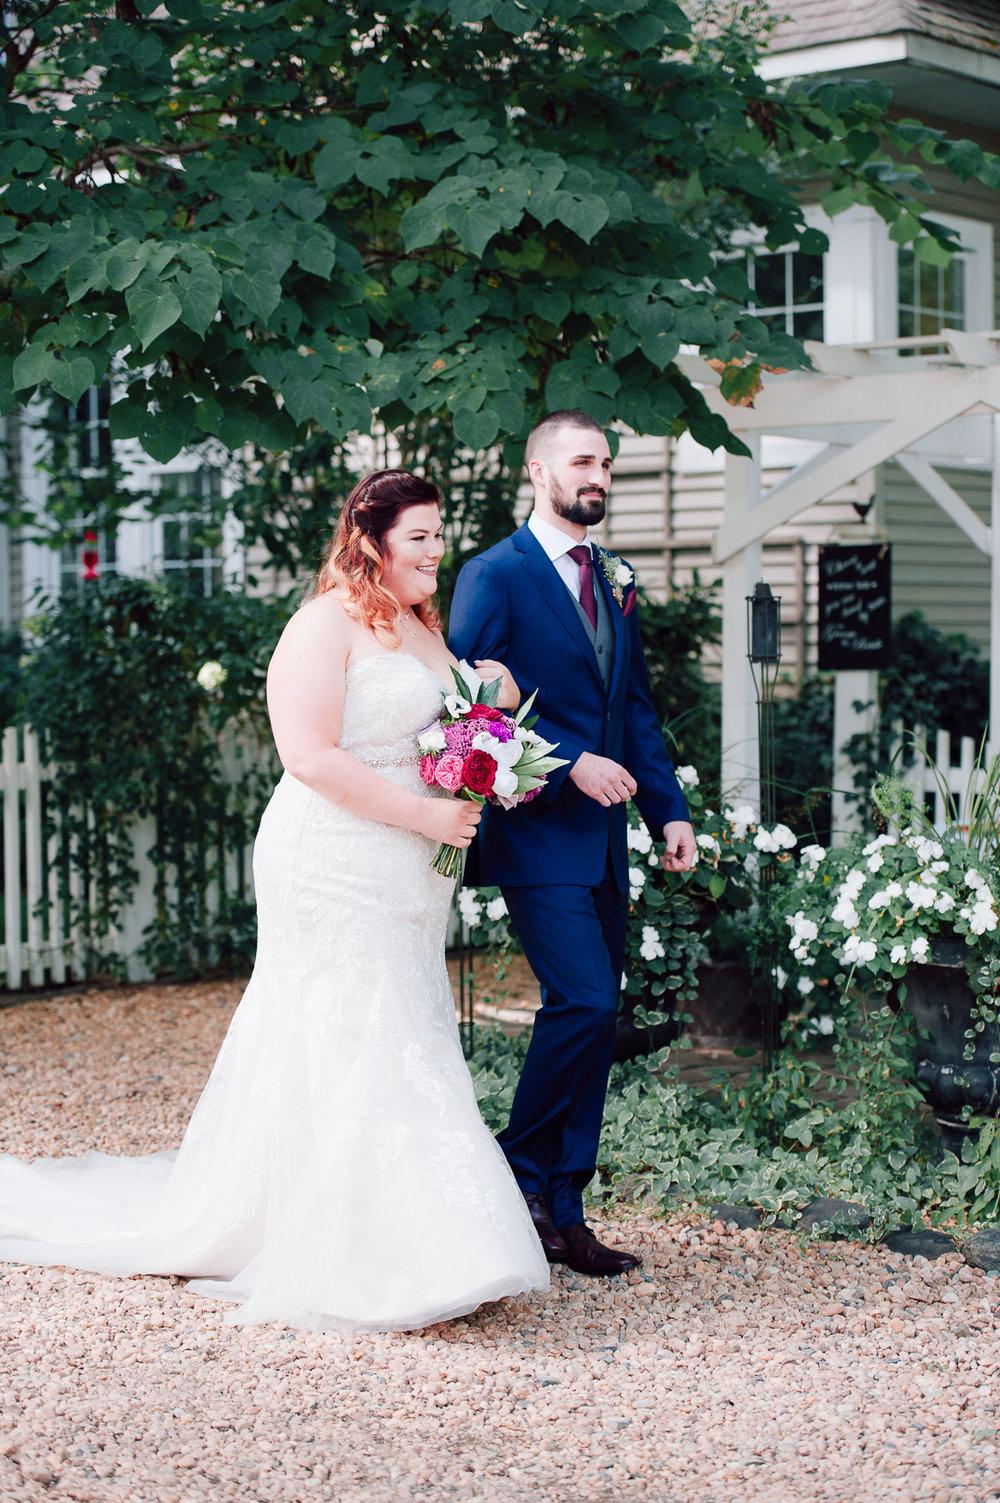 virginiawedding_GlenGarden_rusticwedding_fredericksburg_youseephotography_KellySteven (44).jpg